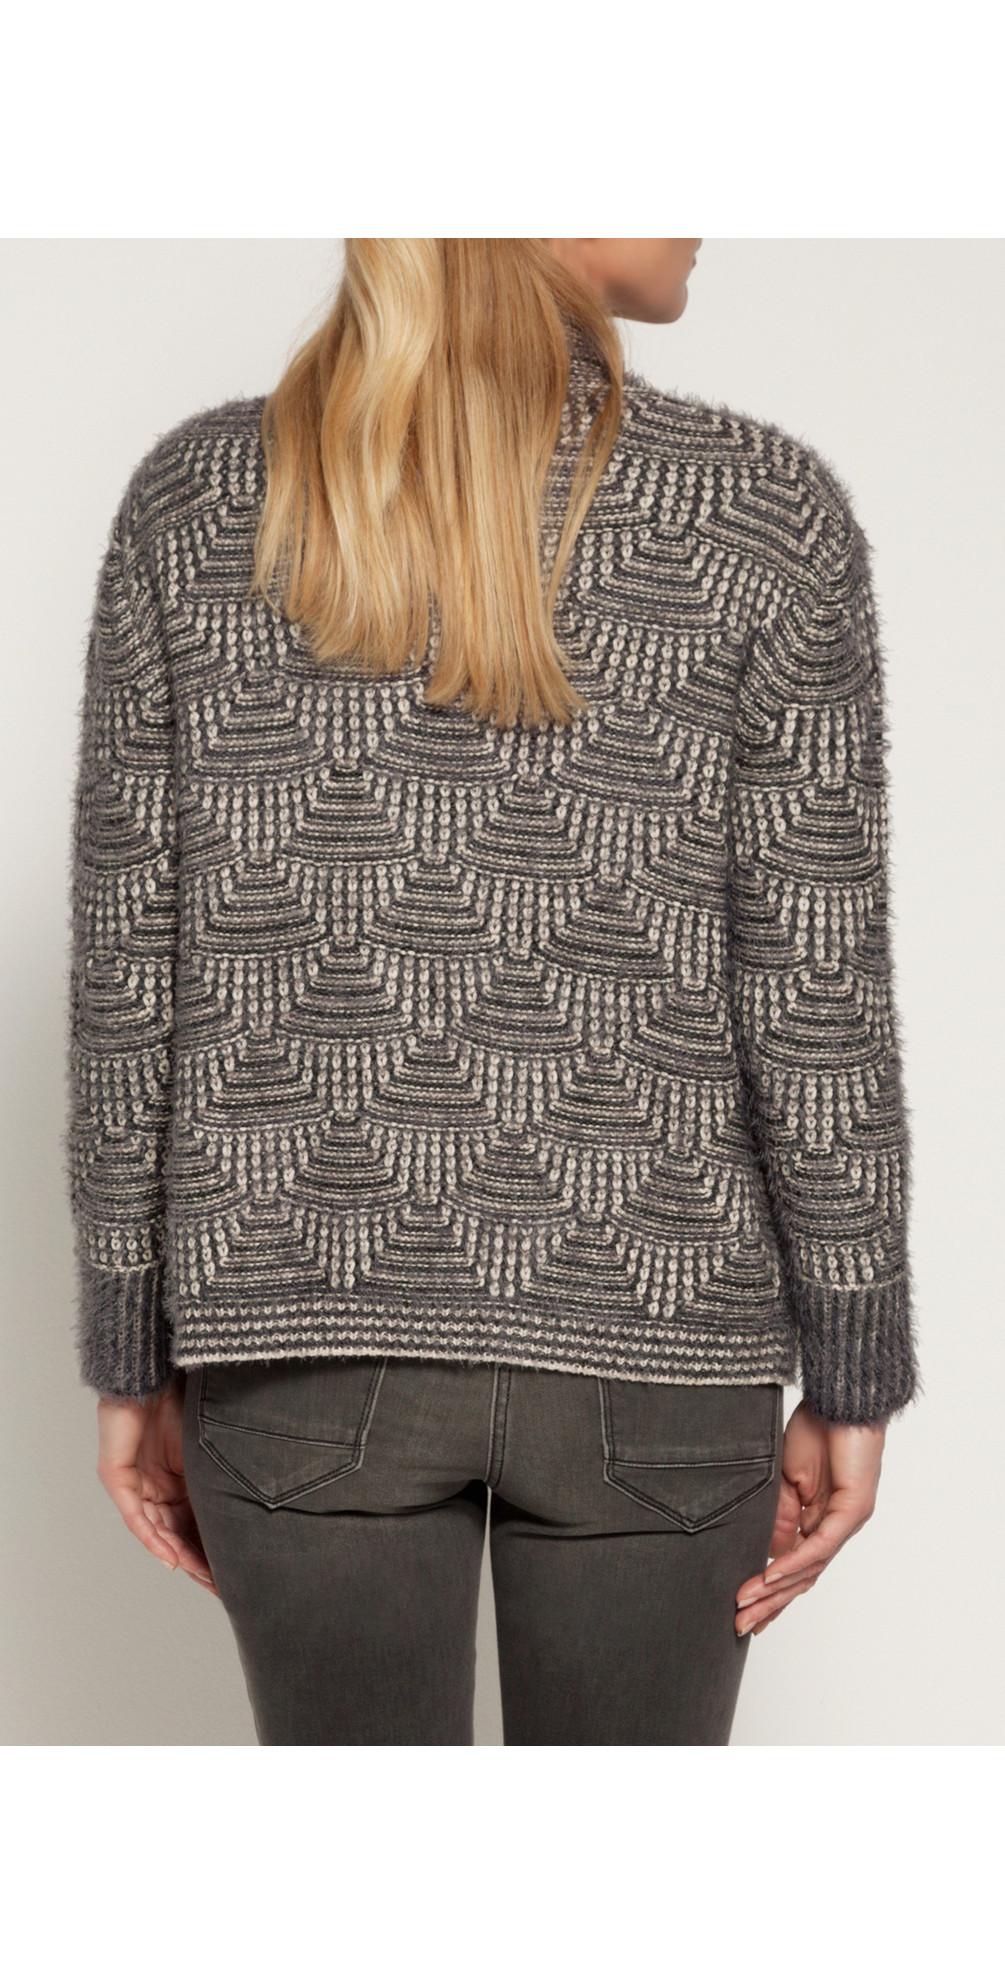 Furry Knit Cardigan main image